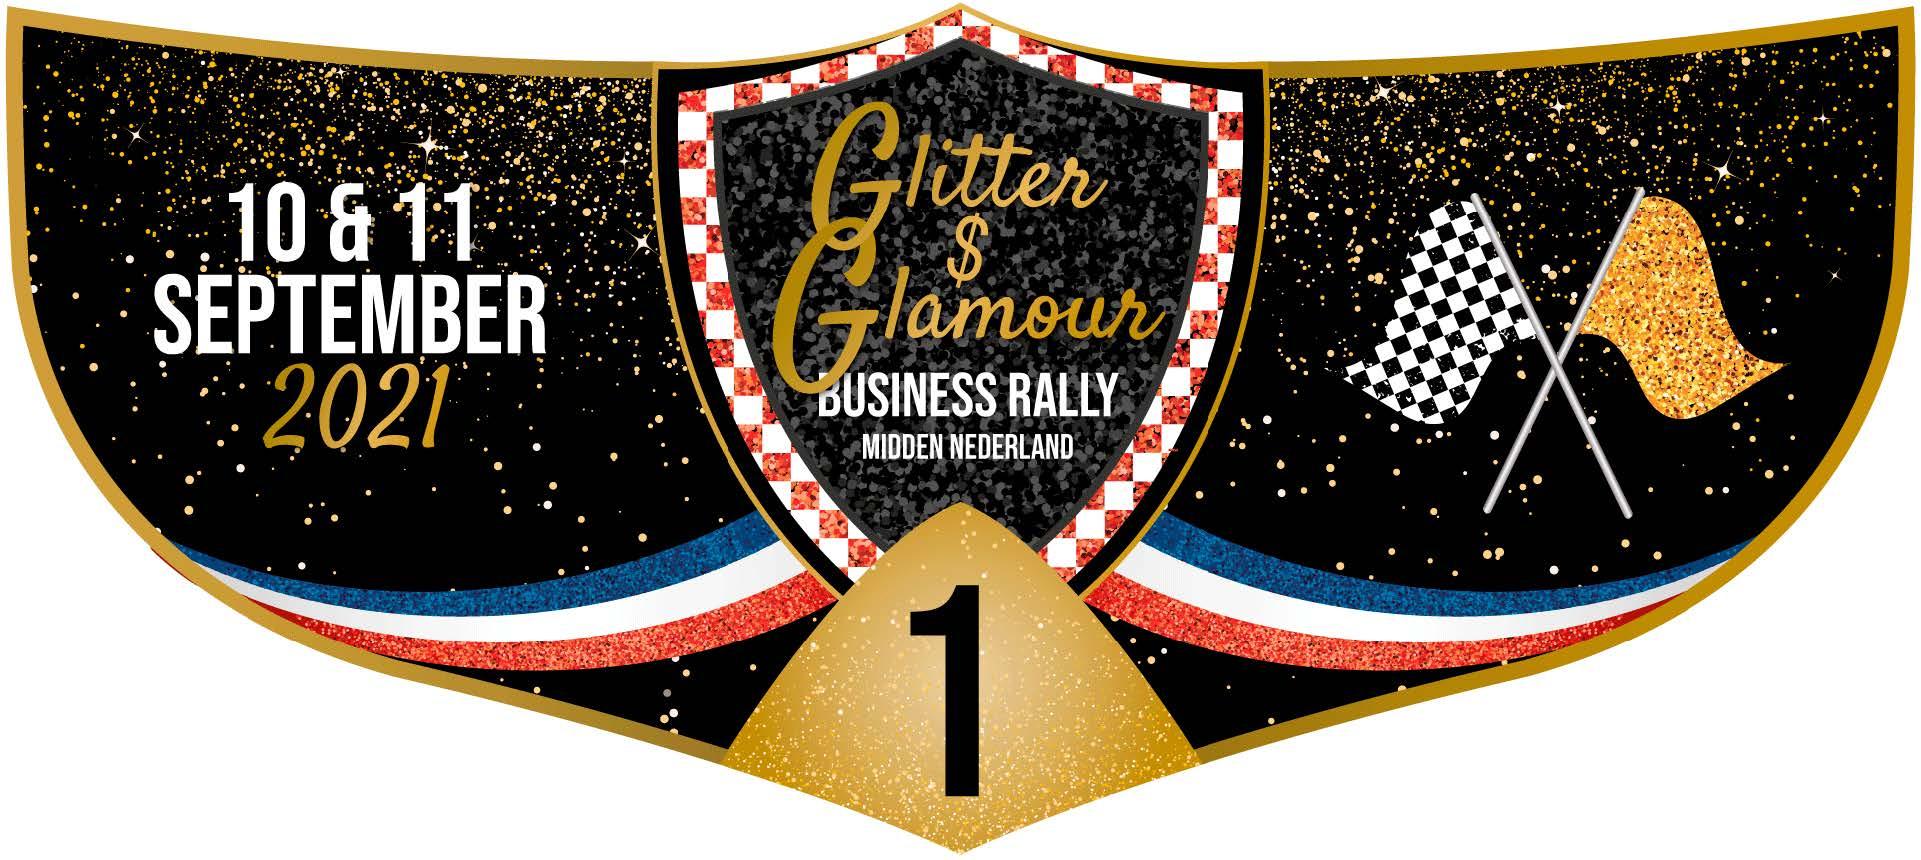 Rally_Glitter&Glamour_100x45mm_2021_v5